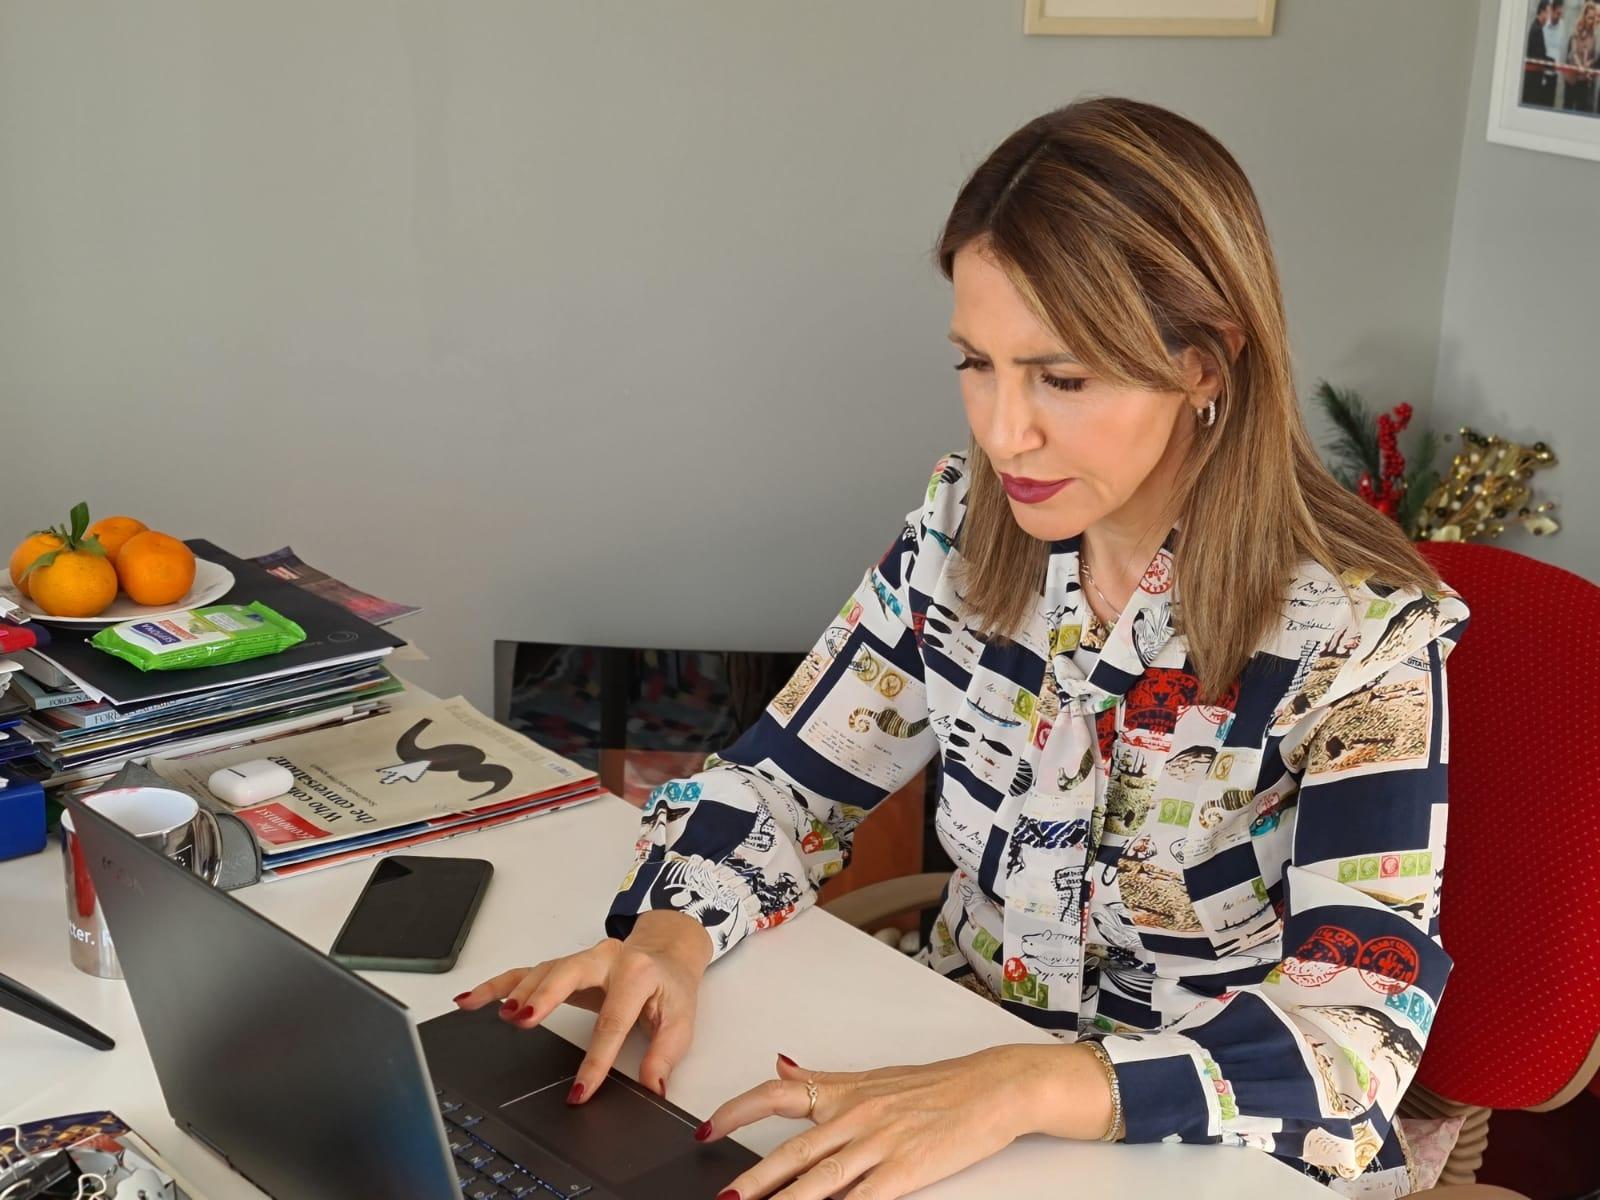 Secretary General of the Regional Cooperation Coucil (RCC) Majlinda Bregu